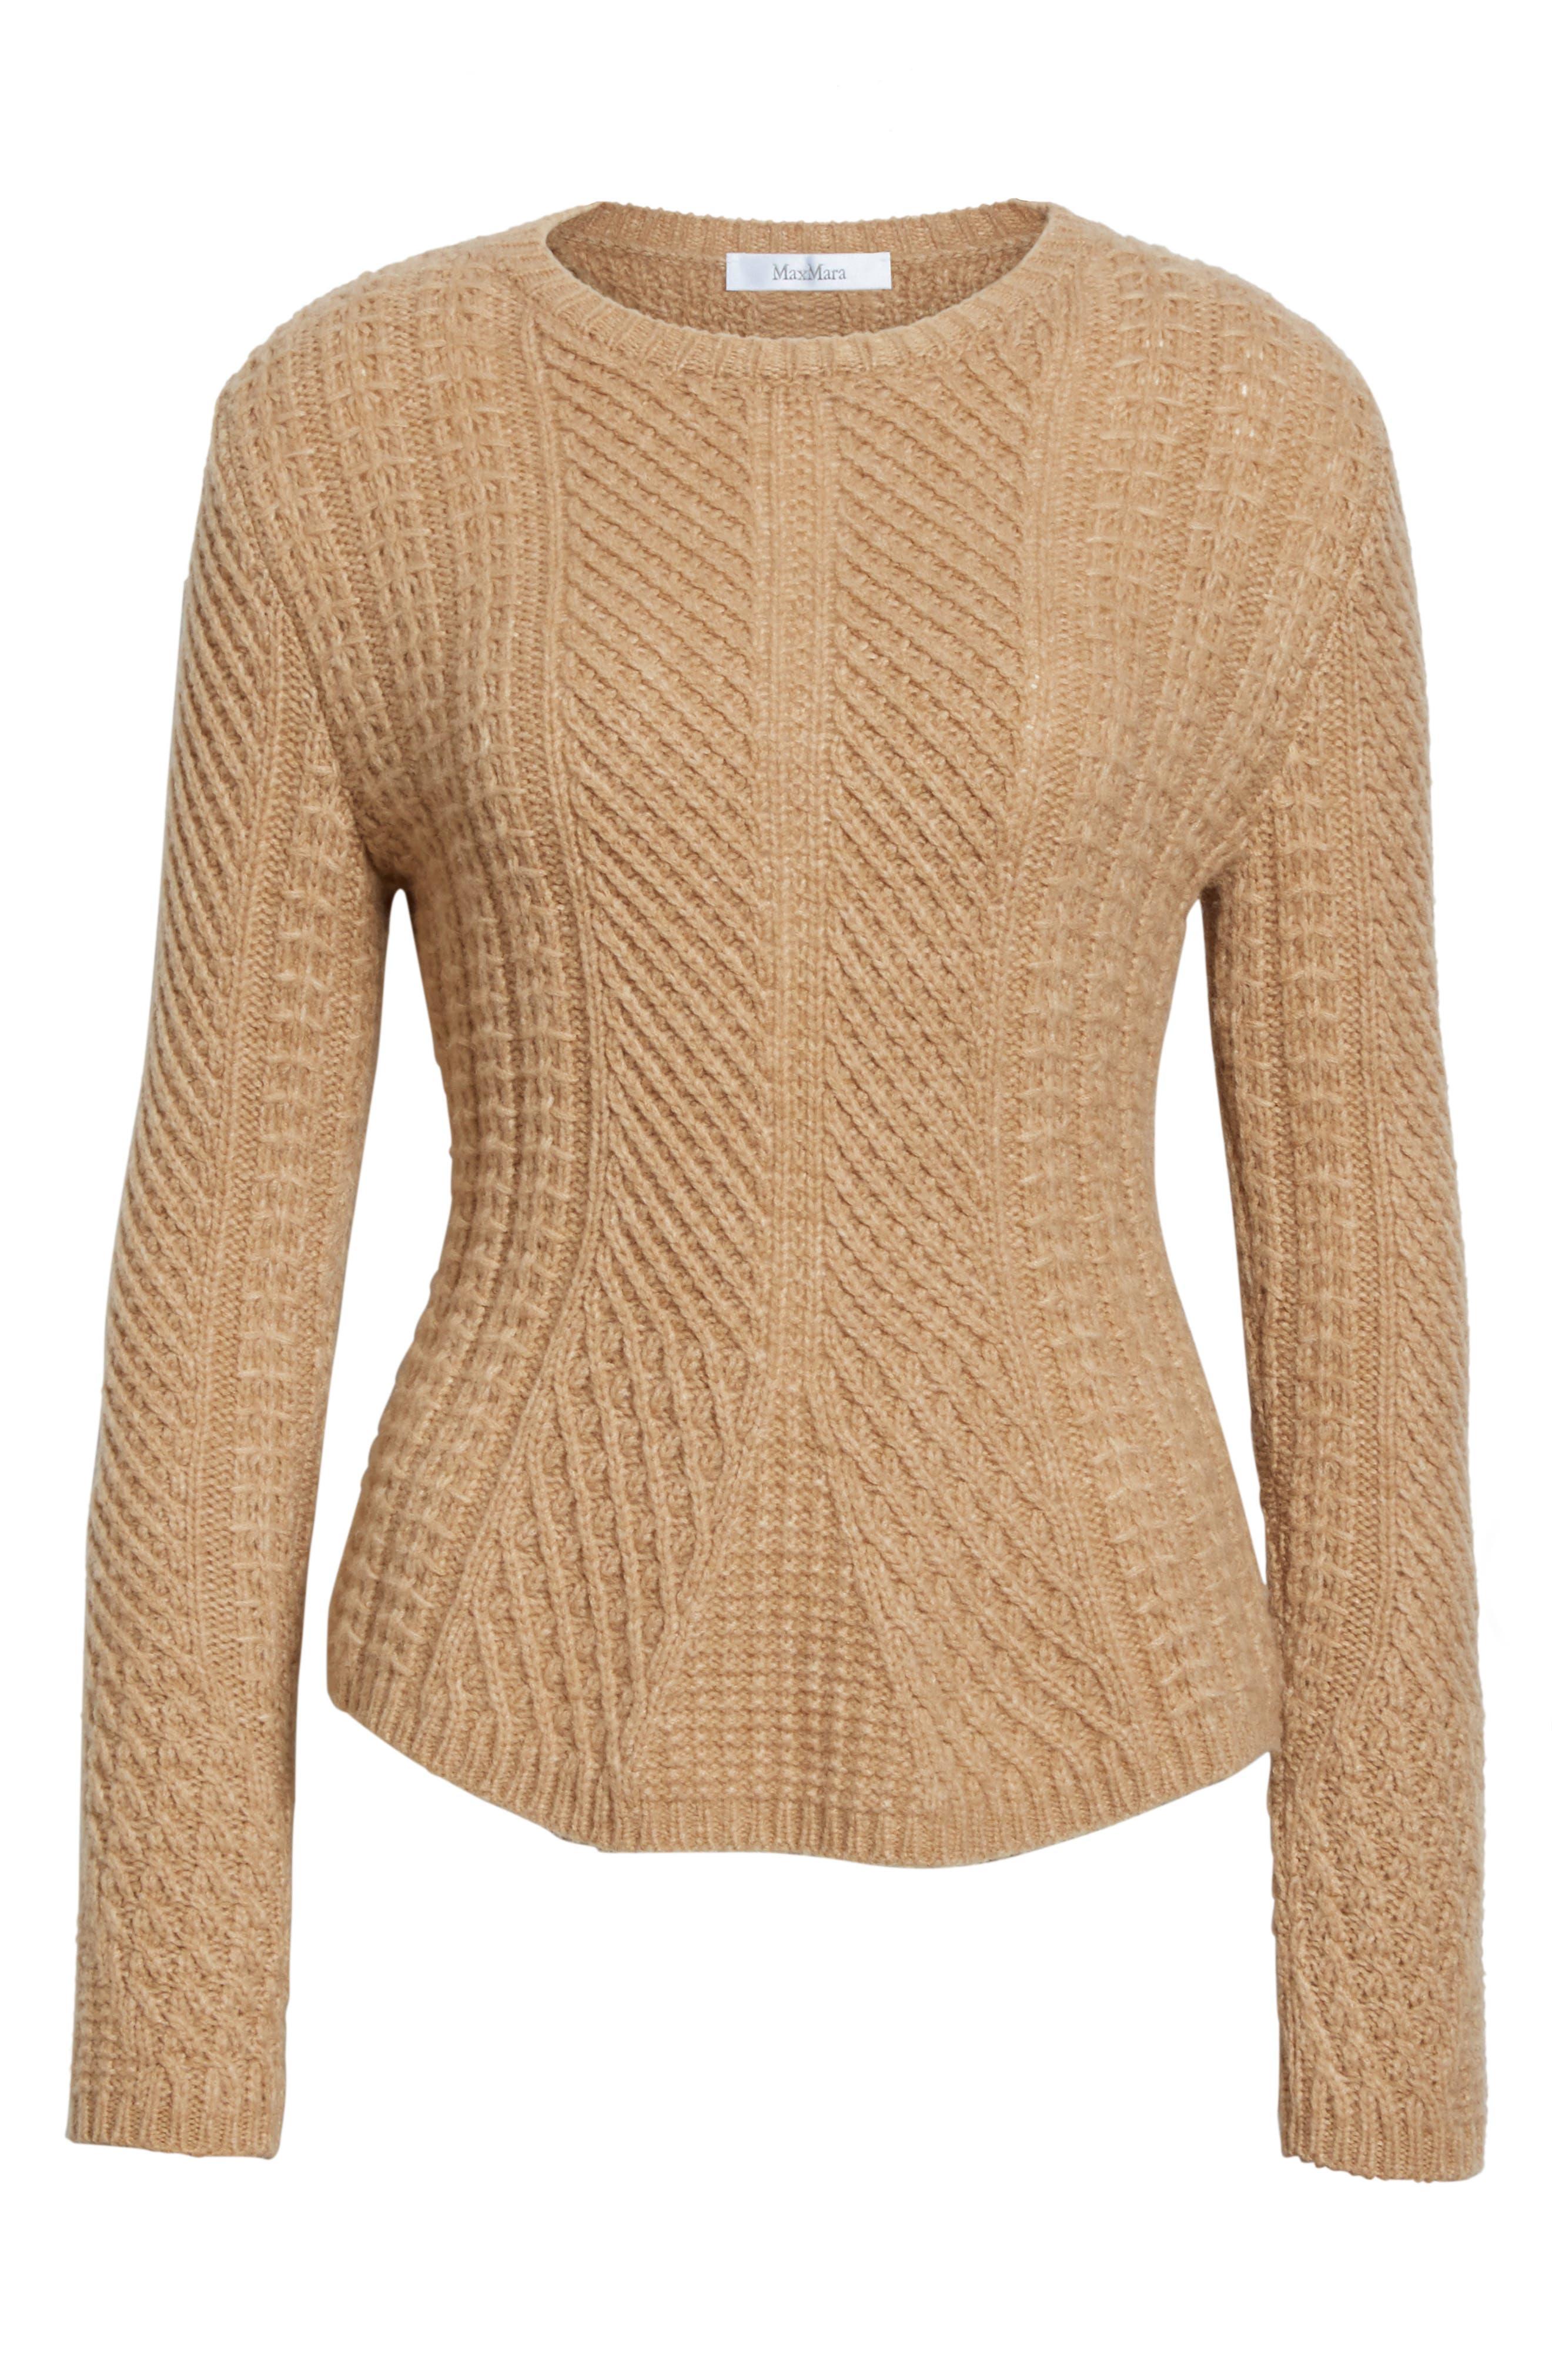 Ronco Sweater,                             Alternate thumbnail 4, color,                             Camel